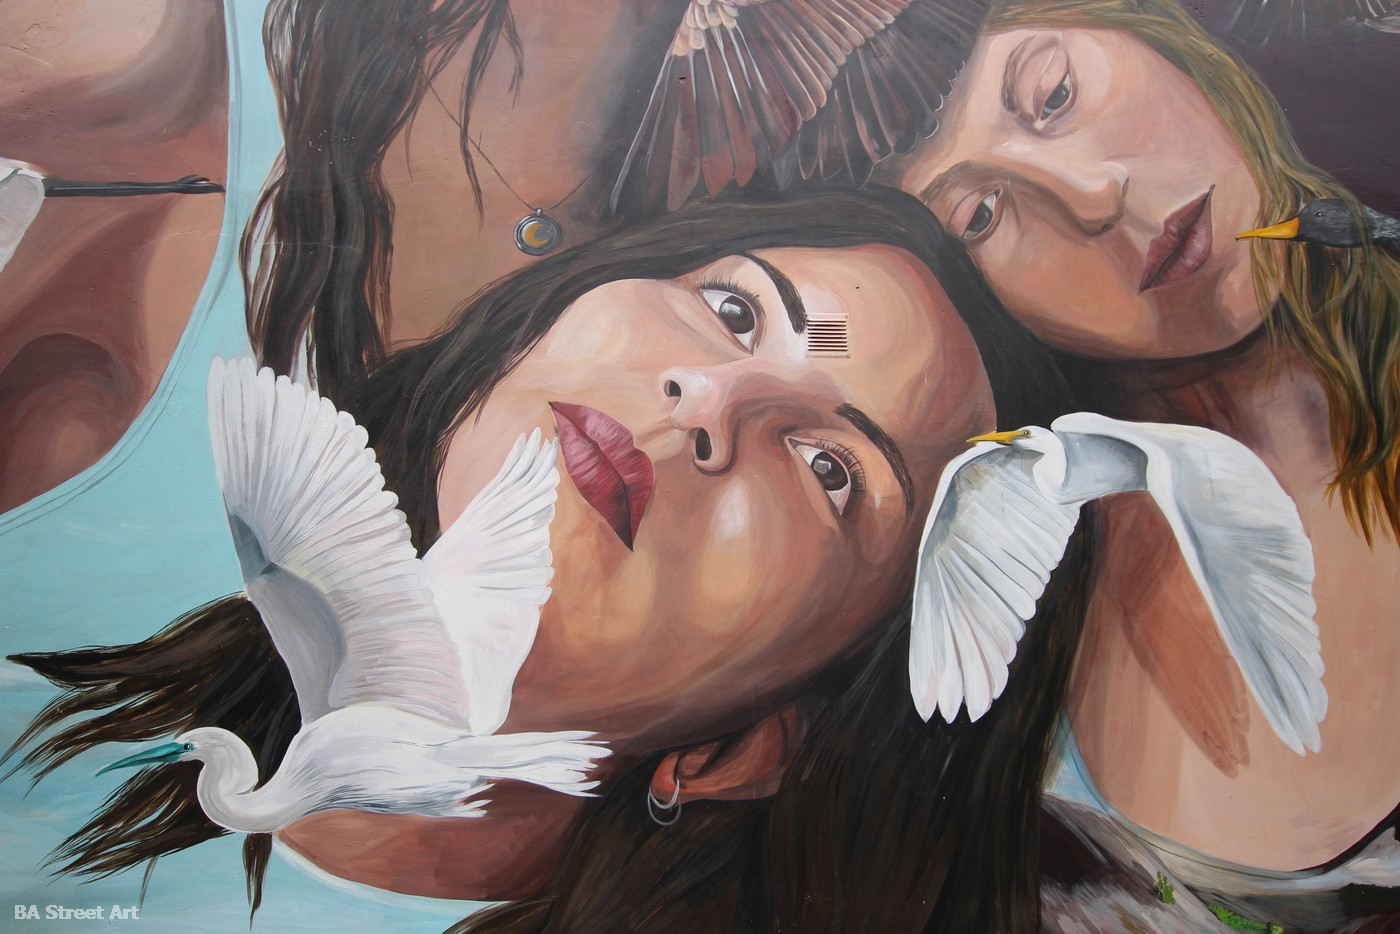 mabel vincentef mujeres retratos murales feminisimo derechos de mujeres arte urbano naturaleza mural buenos aires argentina